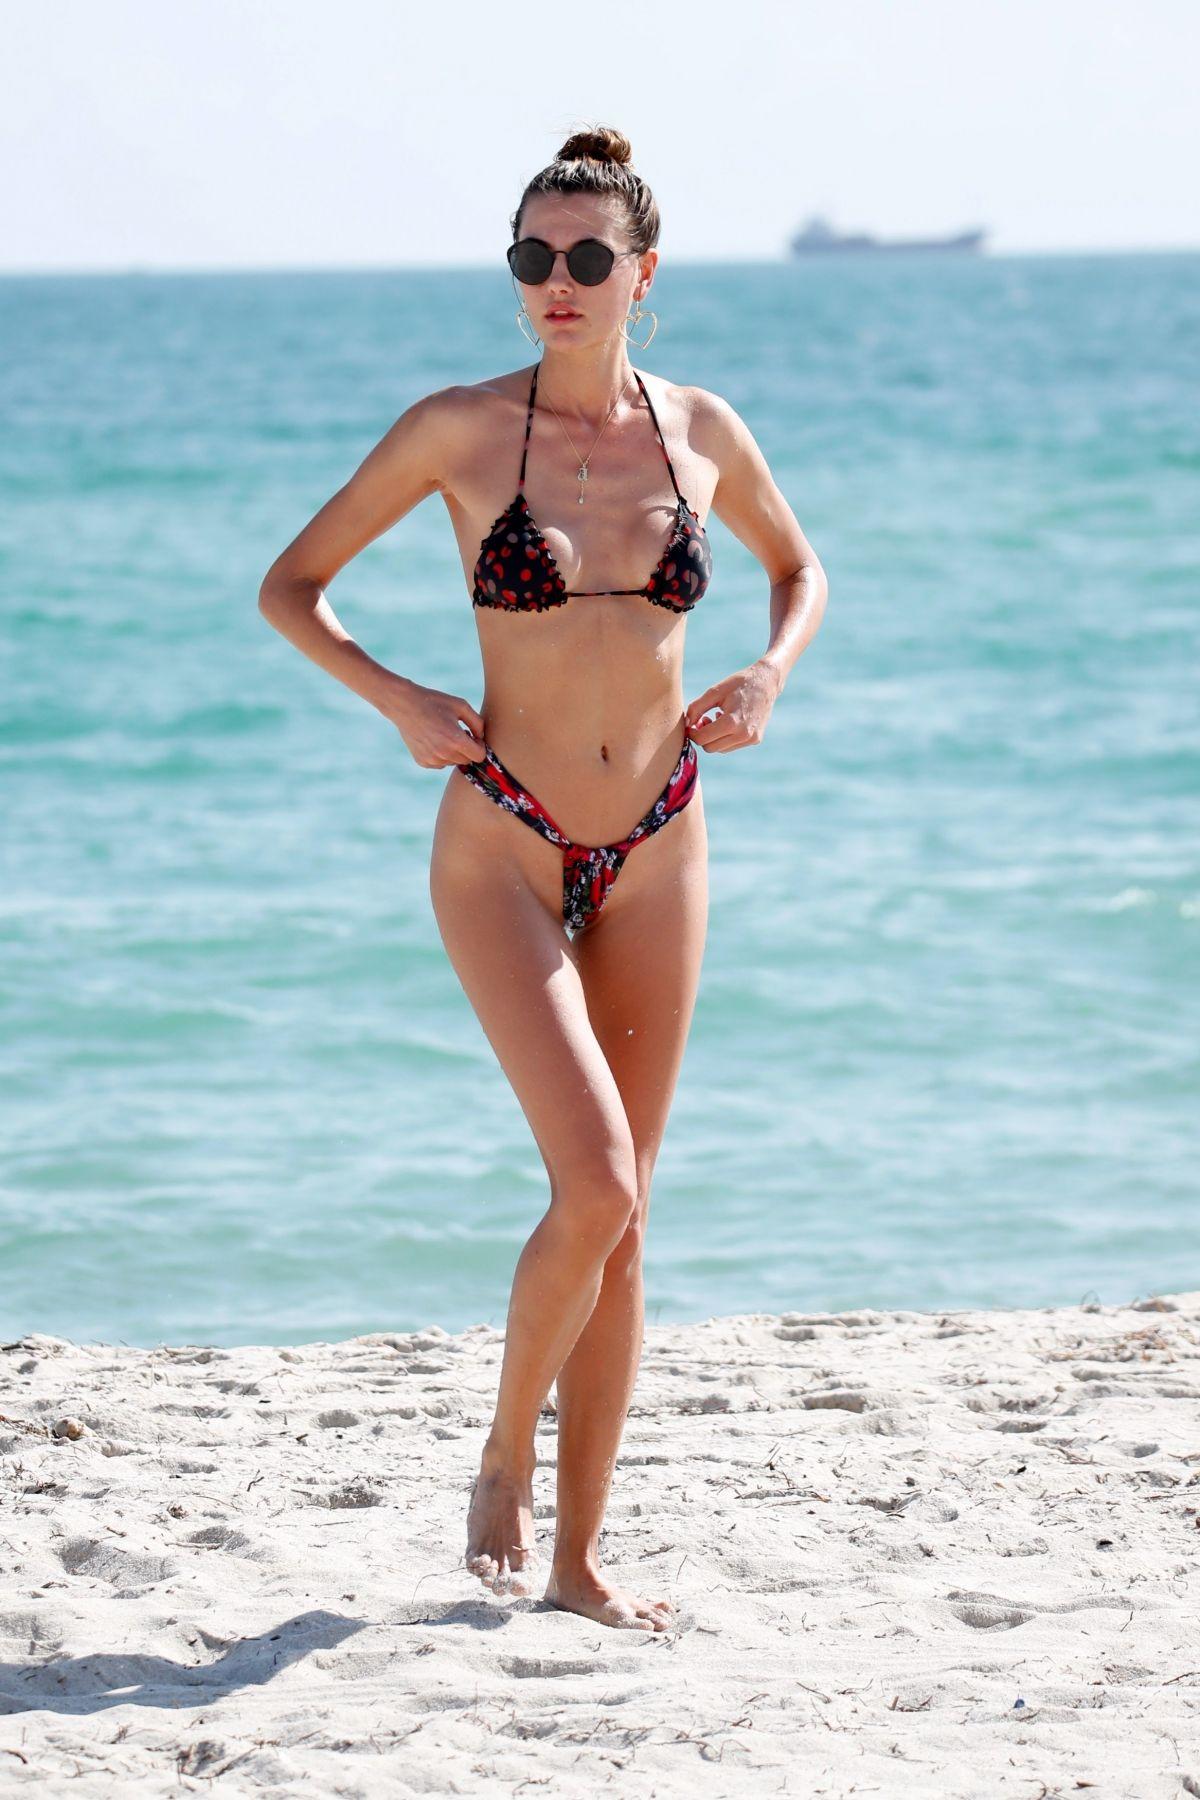 Bikini Alina nude (41 photo), Ass, Bikini, Feet, swimsuit 2020